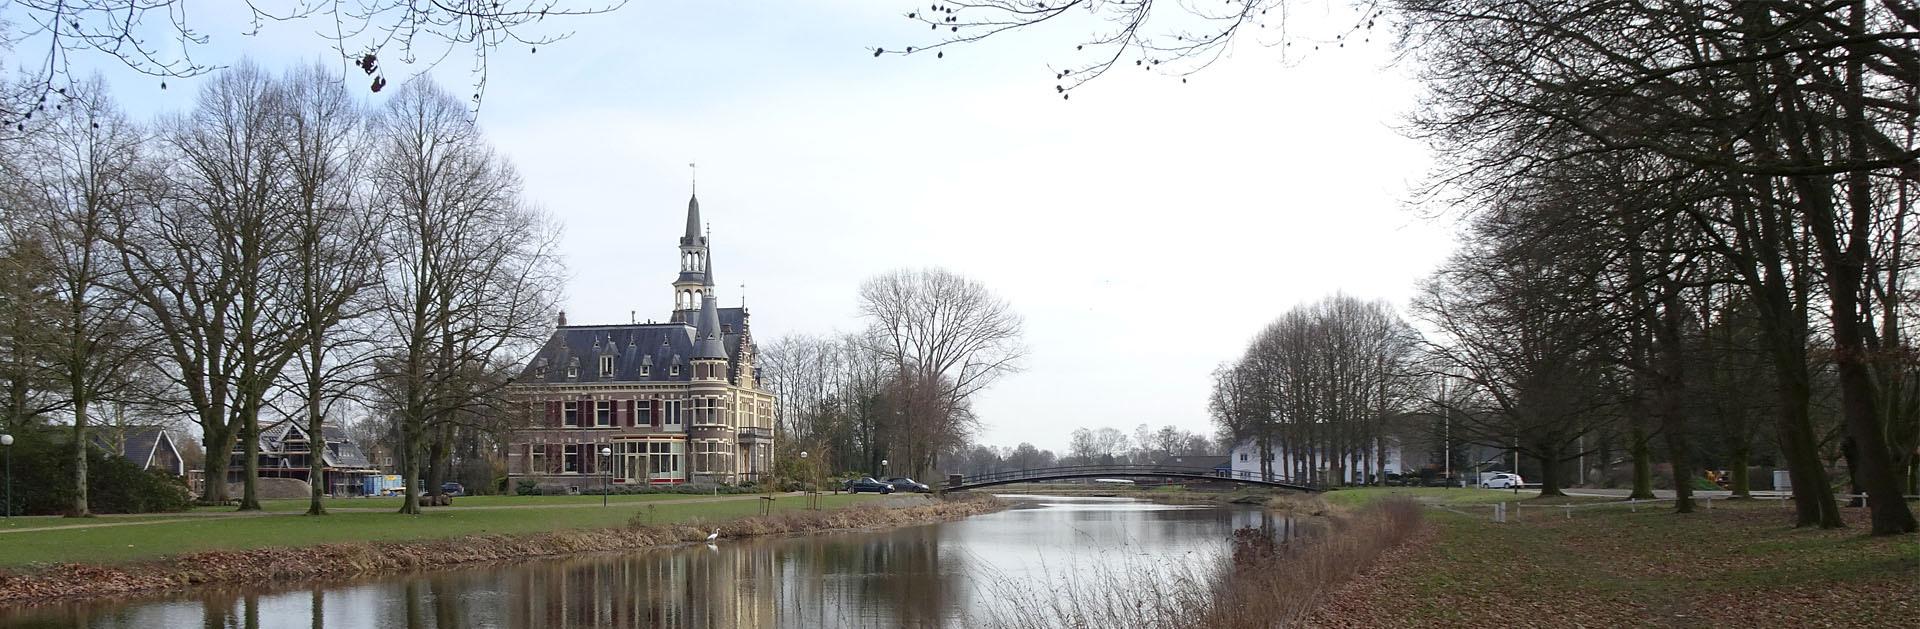 Kasteel de Cloese - Lochem Regio Achterhoek - Liemers